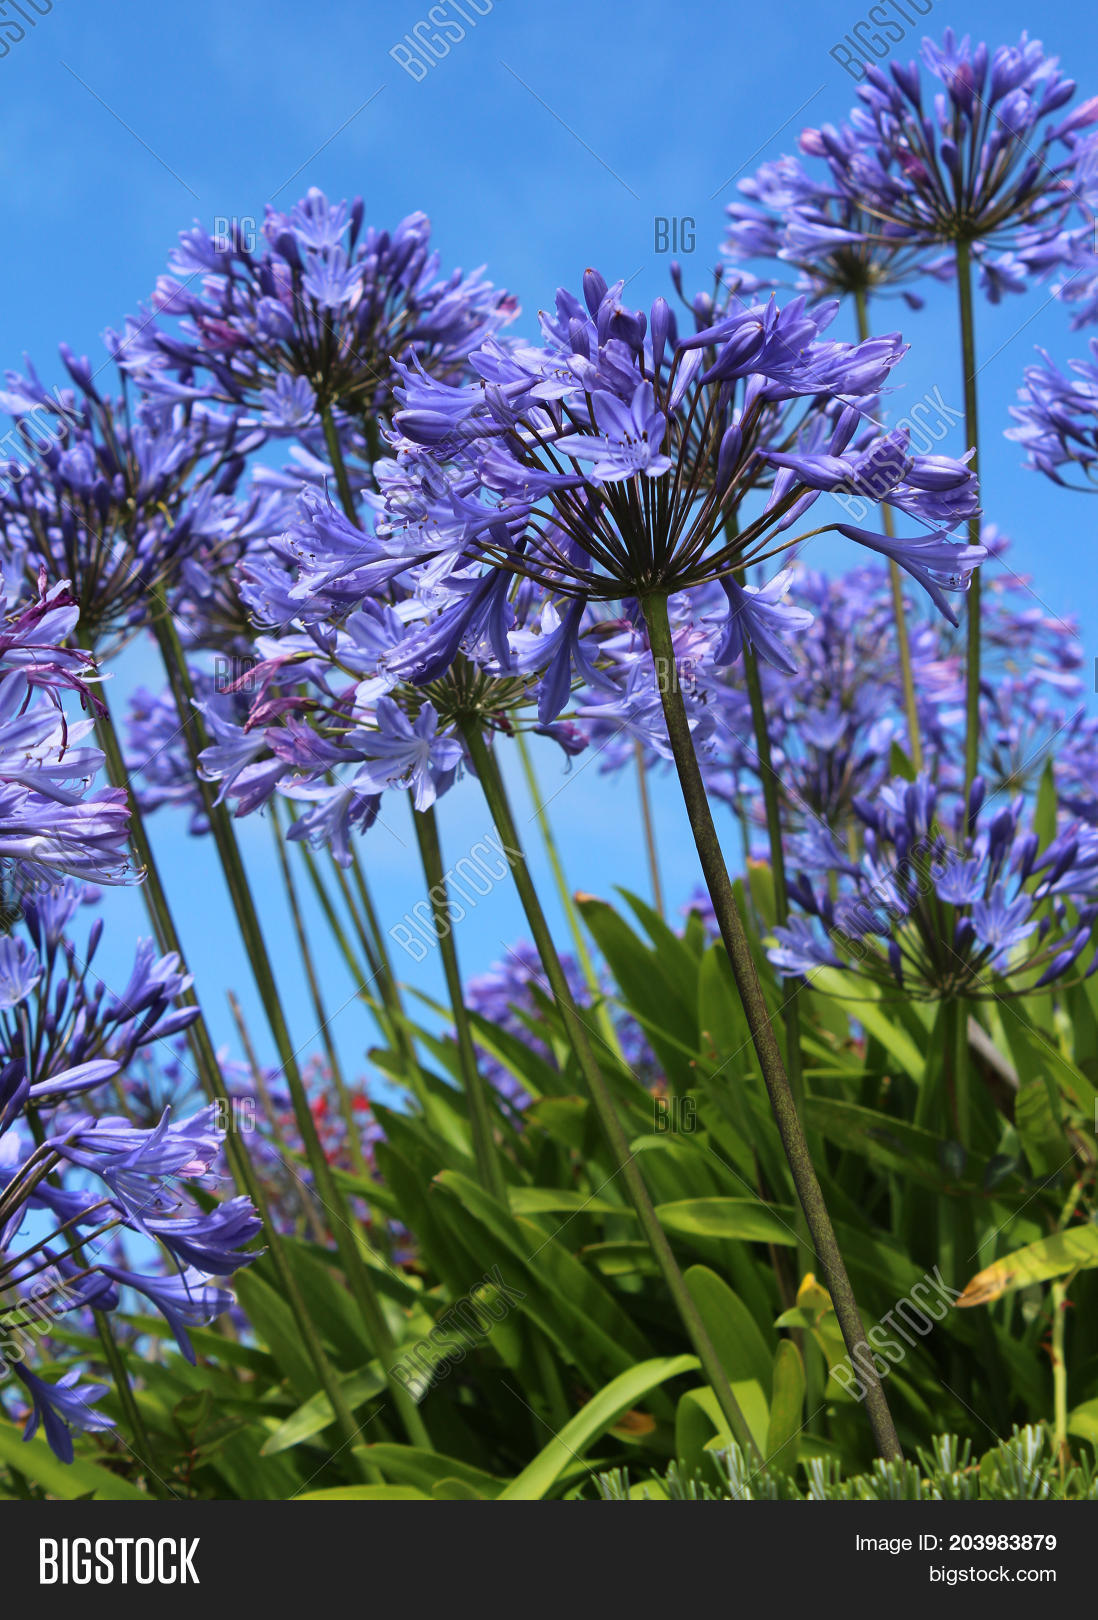 Bright Blue Flowers Image Photo Free Trial Bigstock